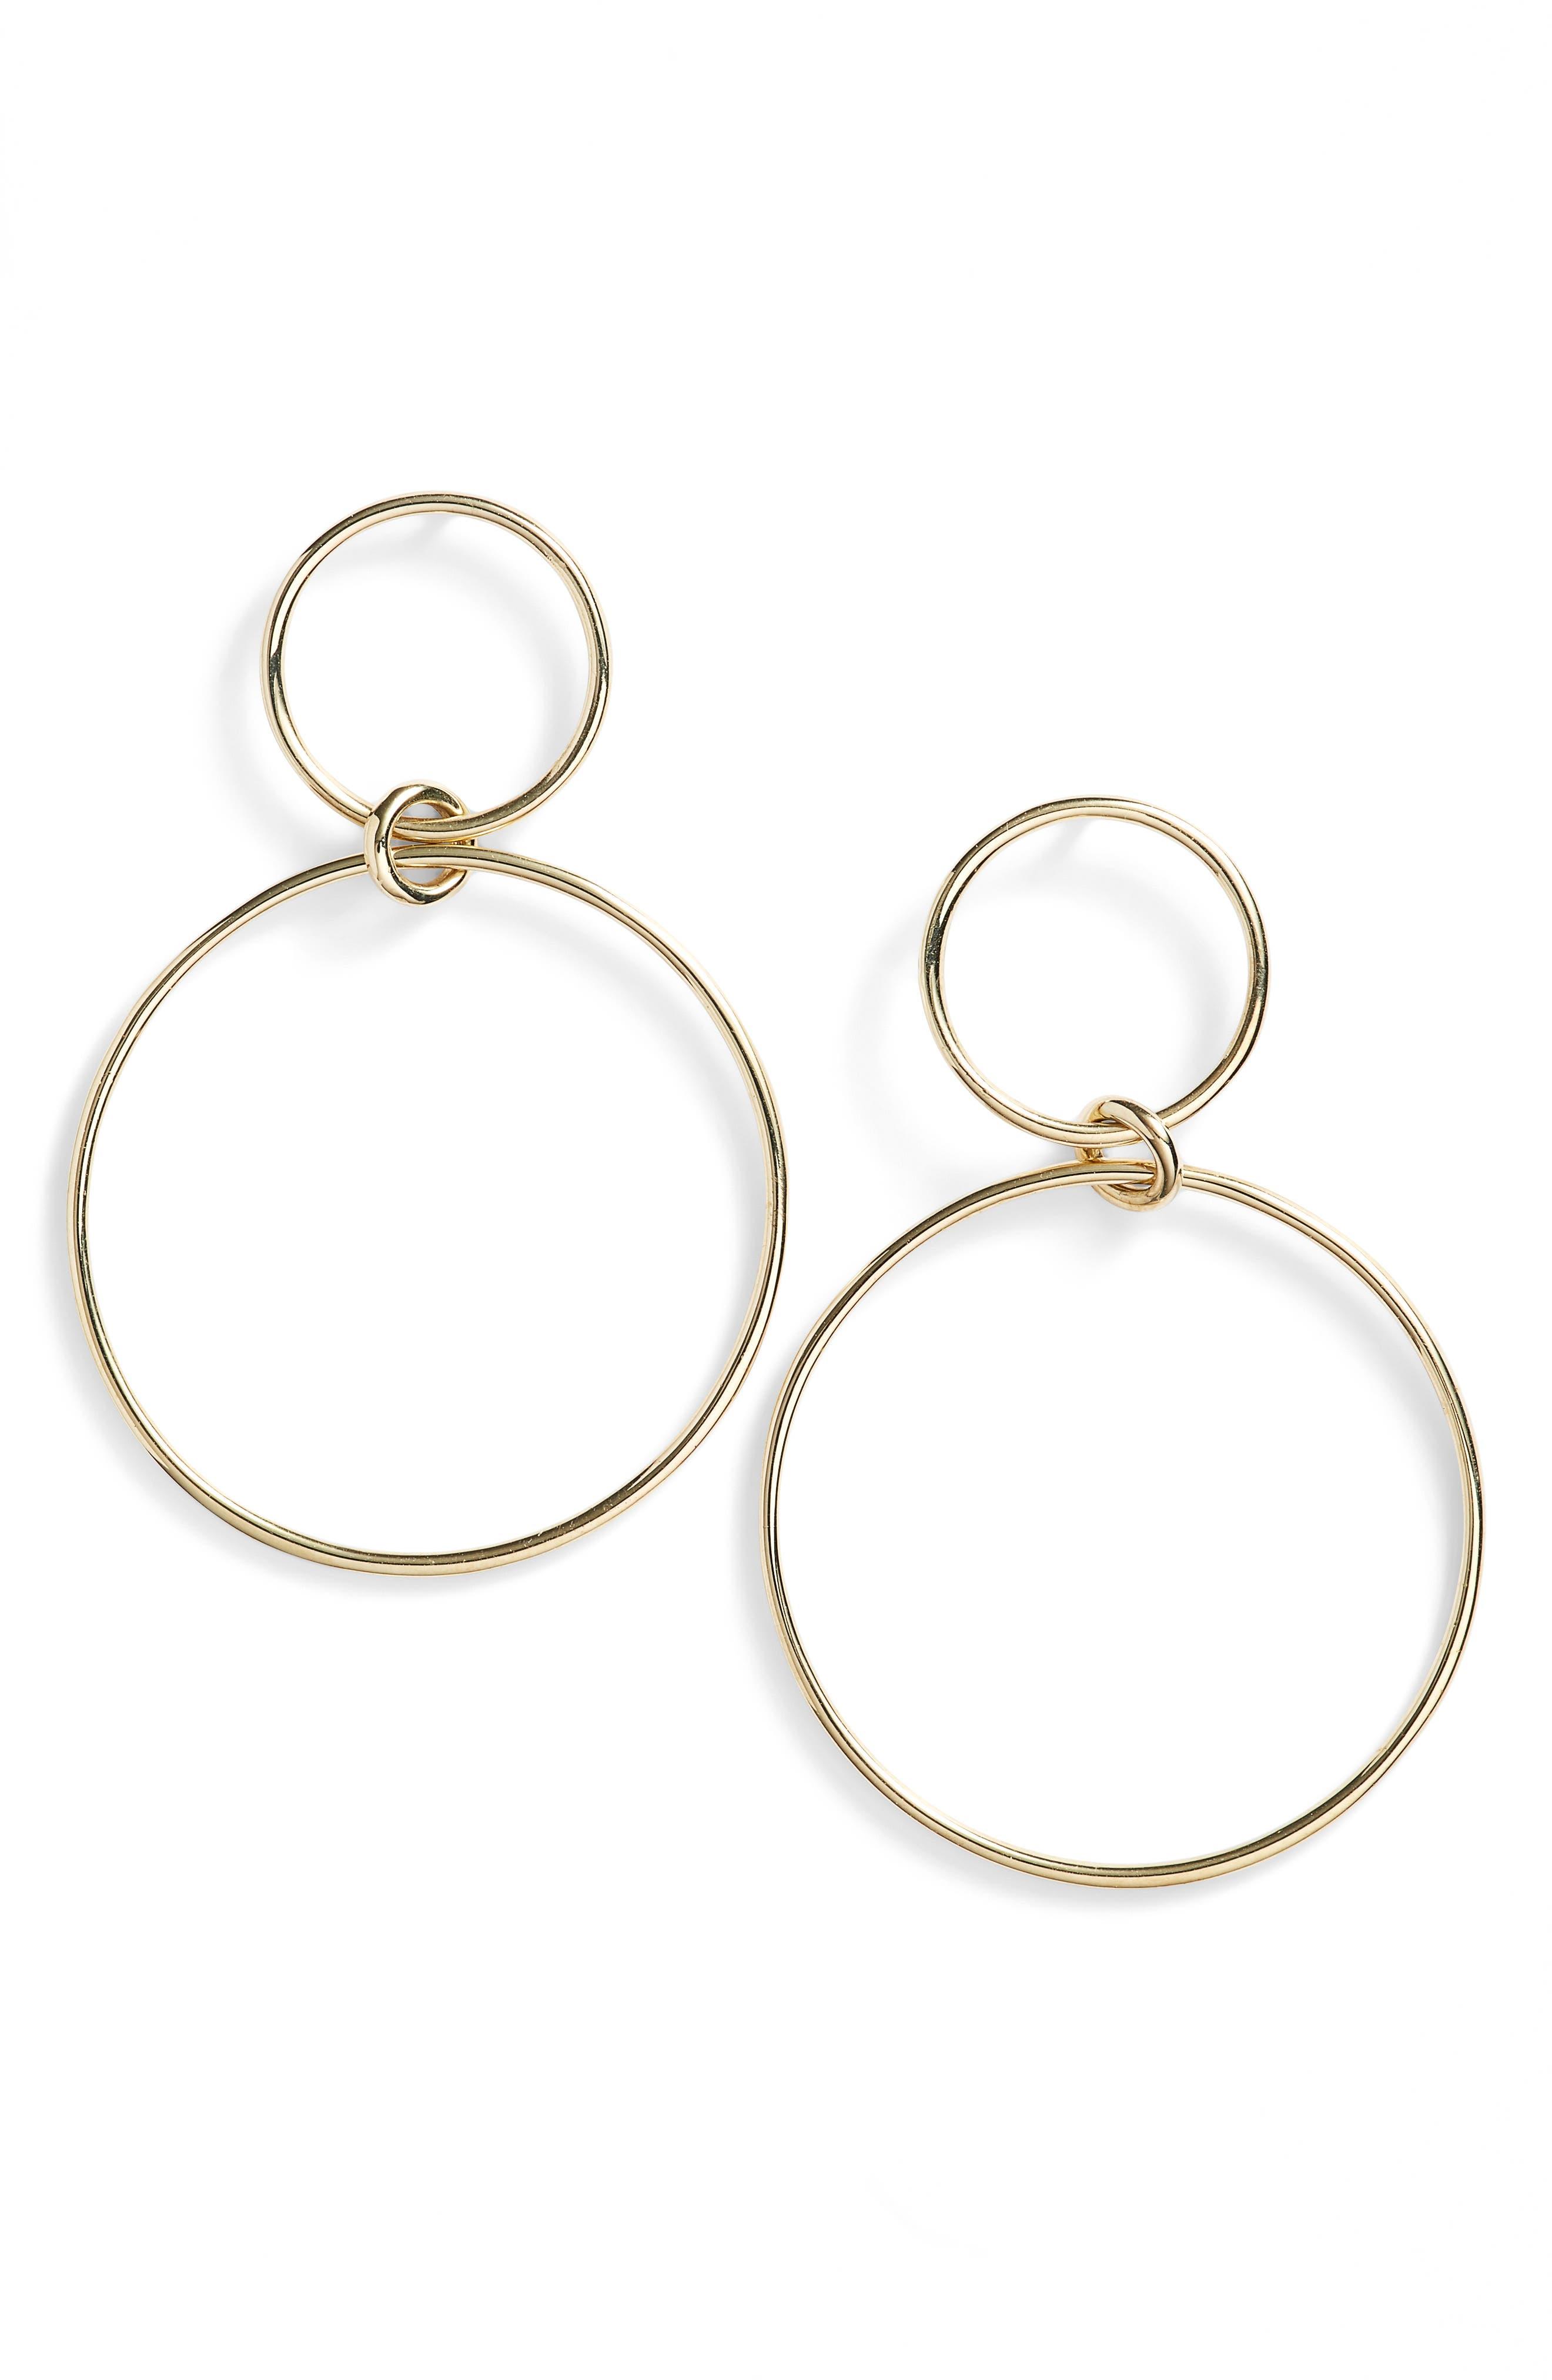 Geo Circle Drop Earrings,                         Main,                         color, Yellow Gold